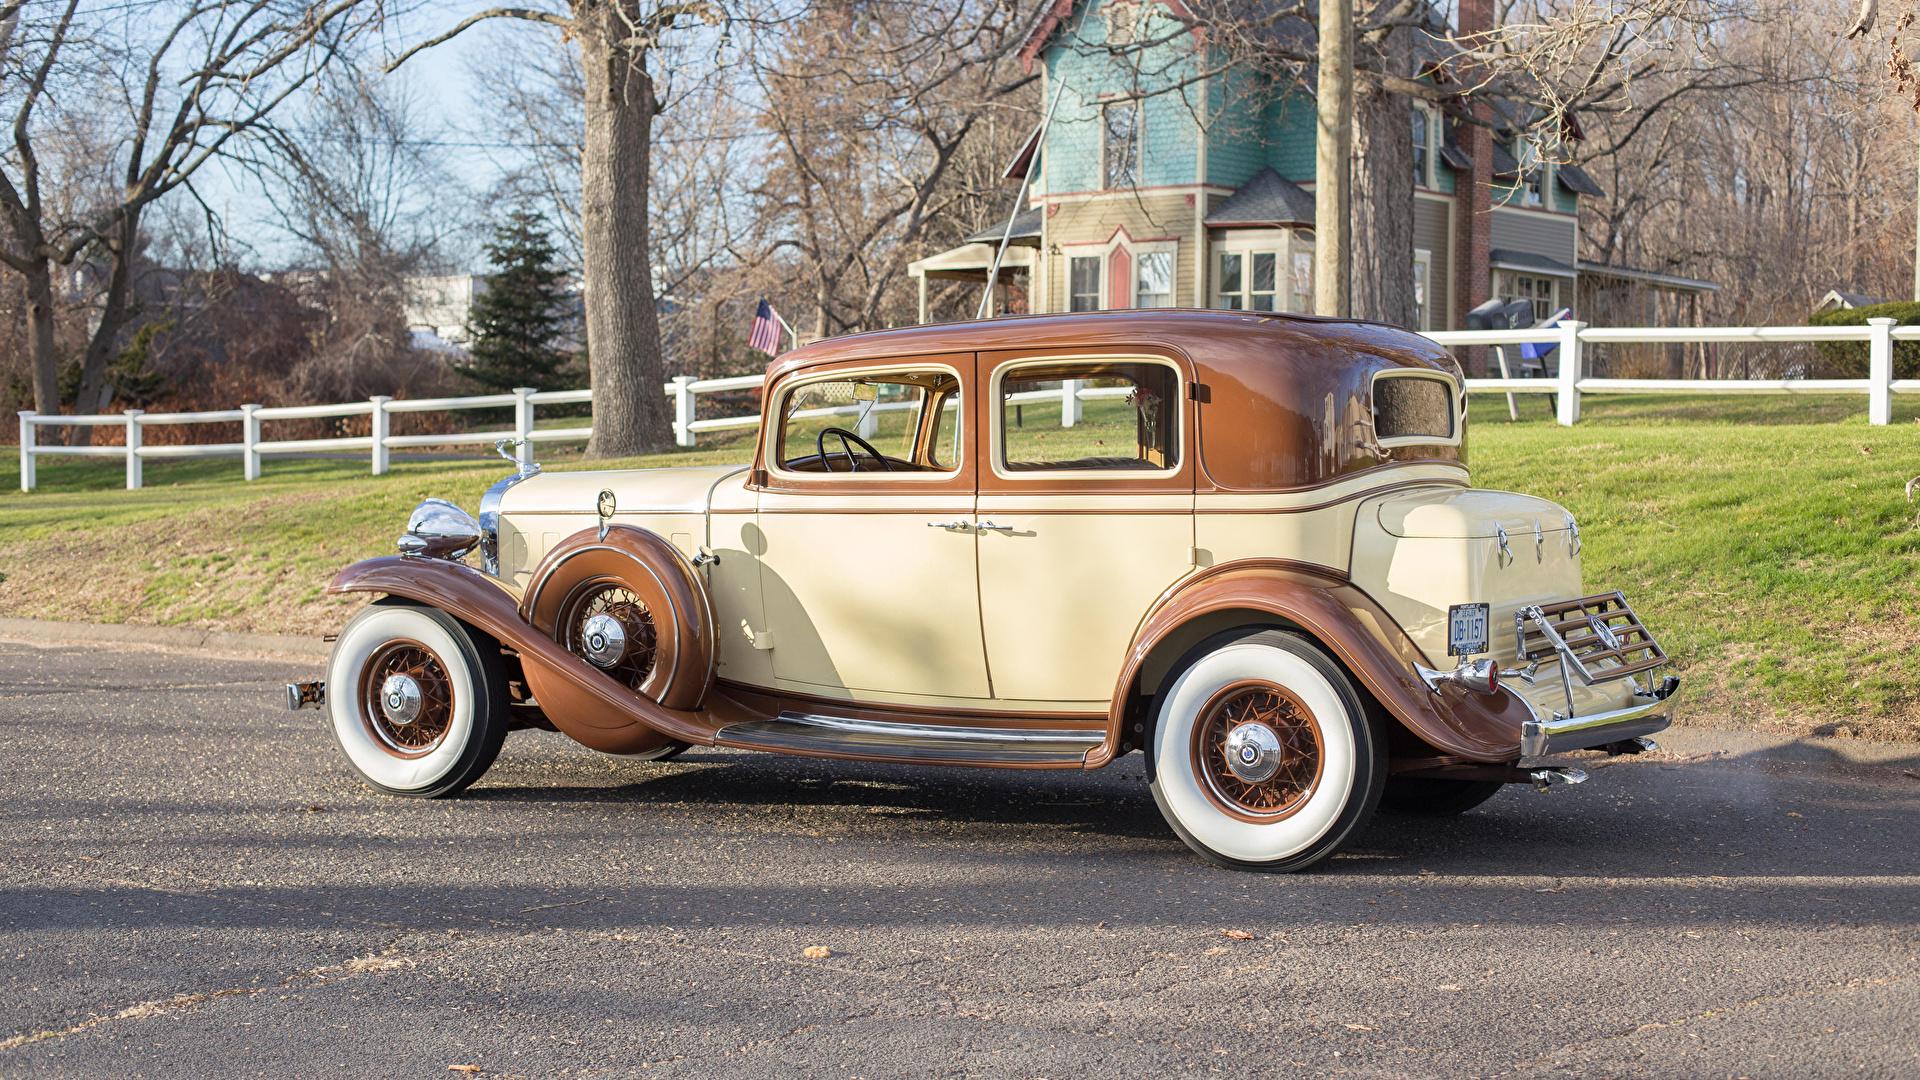 Картинка Cadillac 1932 V12 370-B Town Sedan by Fisher Сбоку Автомобили 1920x1080 Кадиллак авто машины машина автомобиль